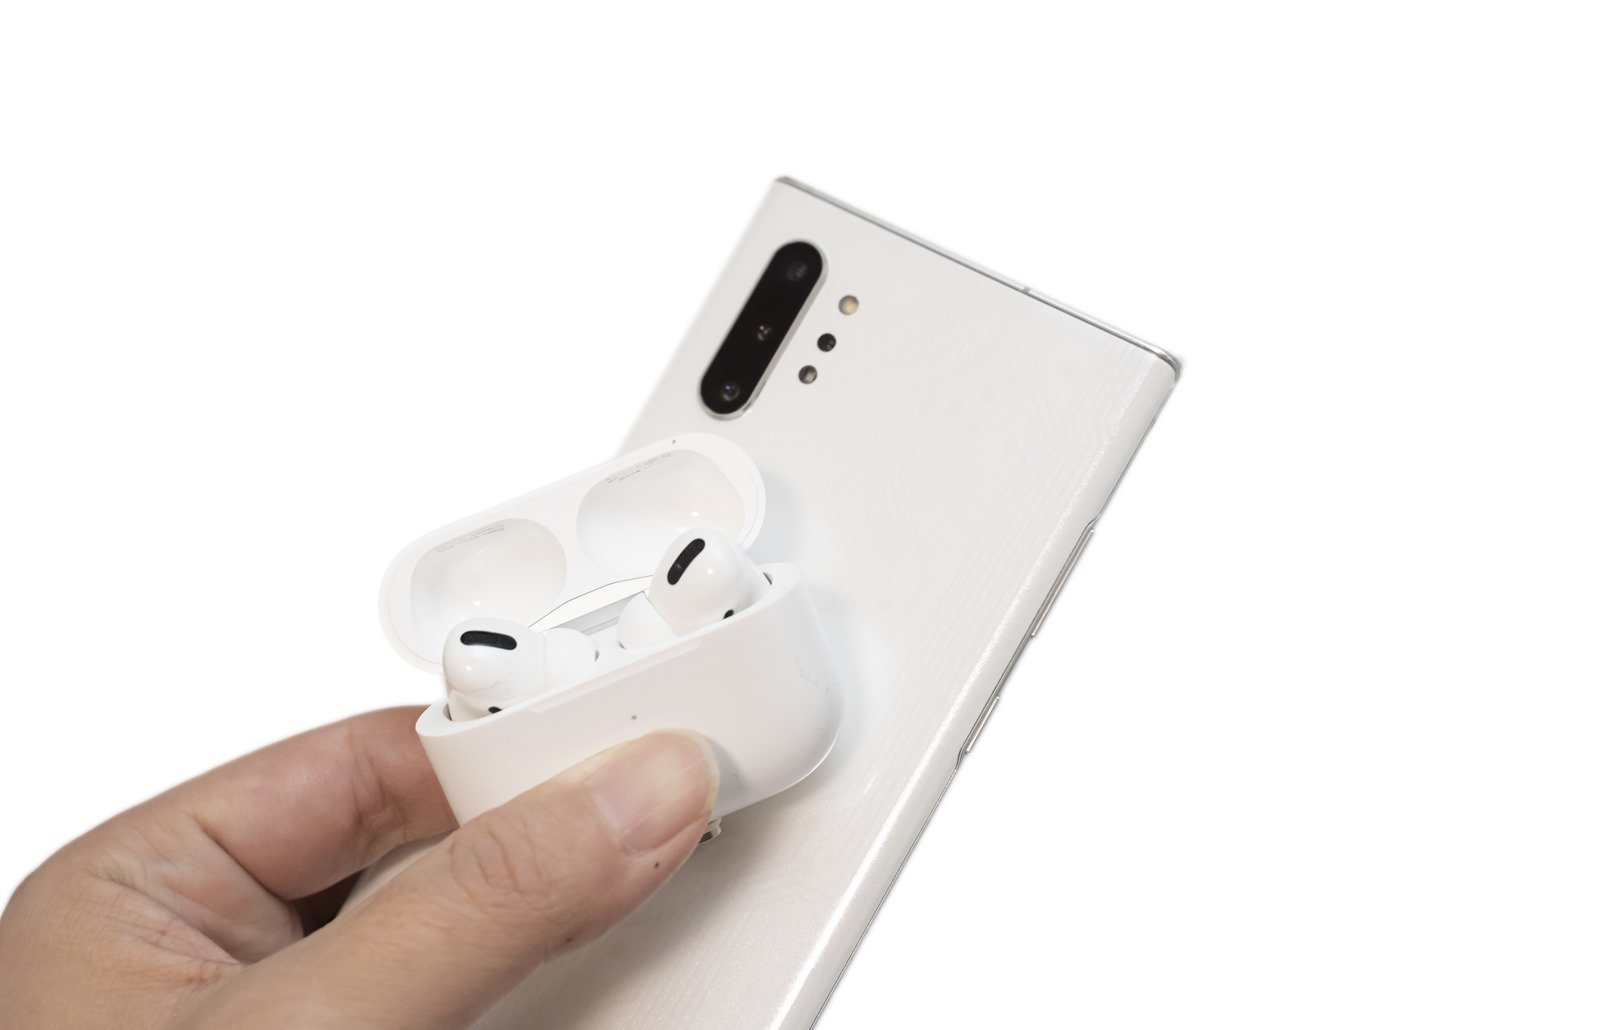 AirPods Pro 能不能配 Android 手機?實測結果報告! @3C 達人廖阿輝